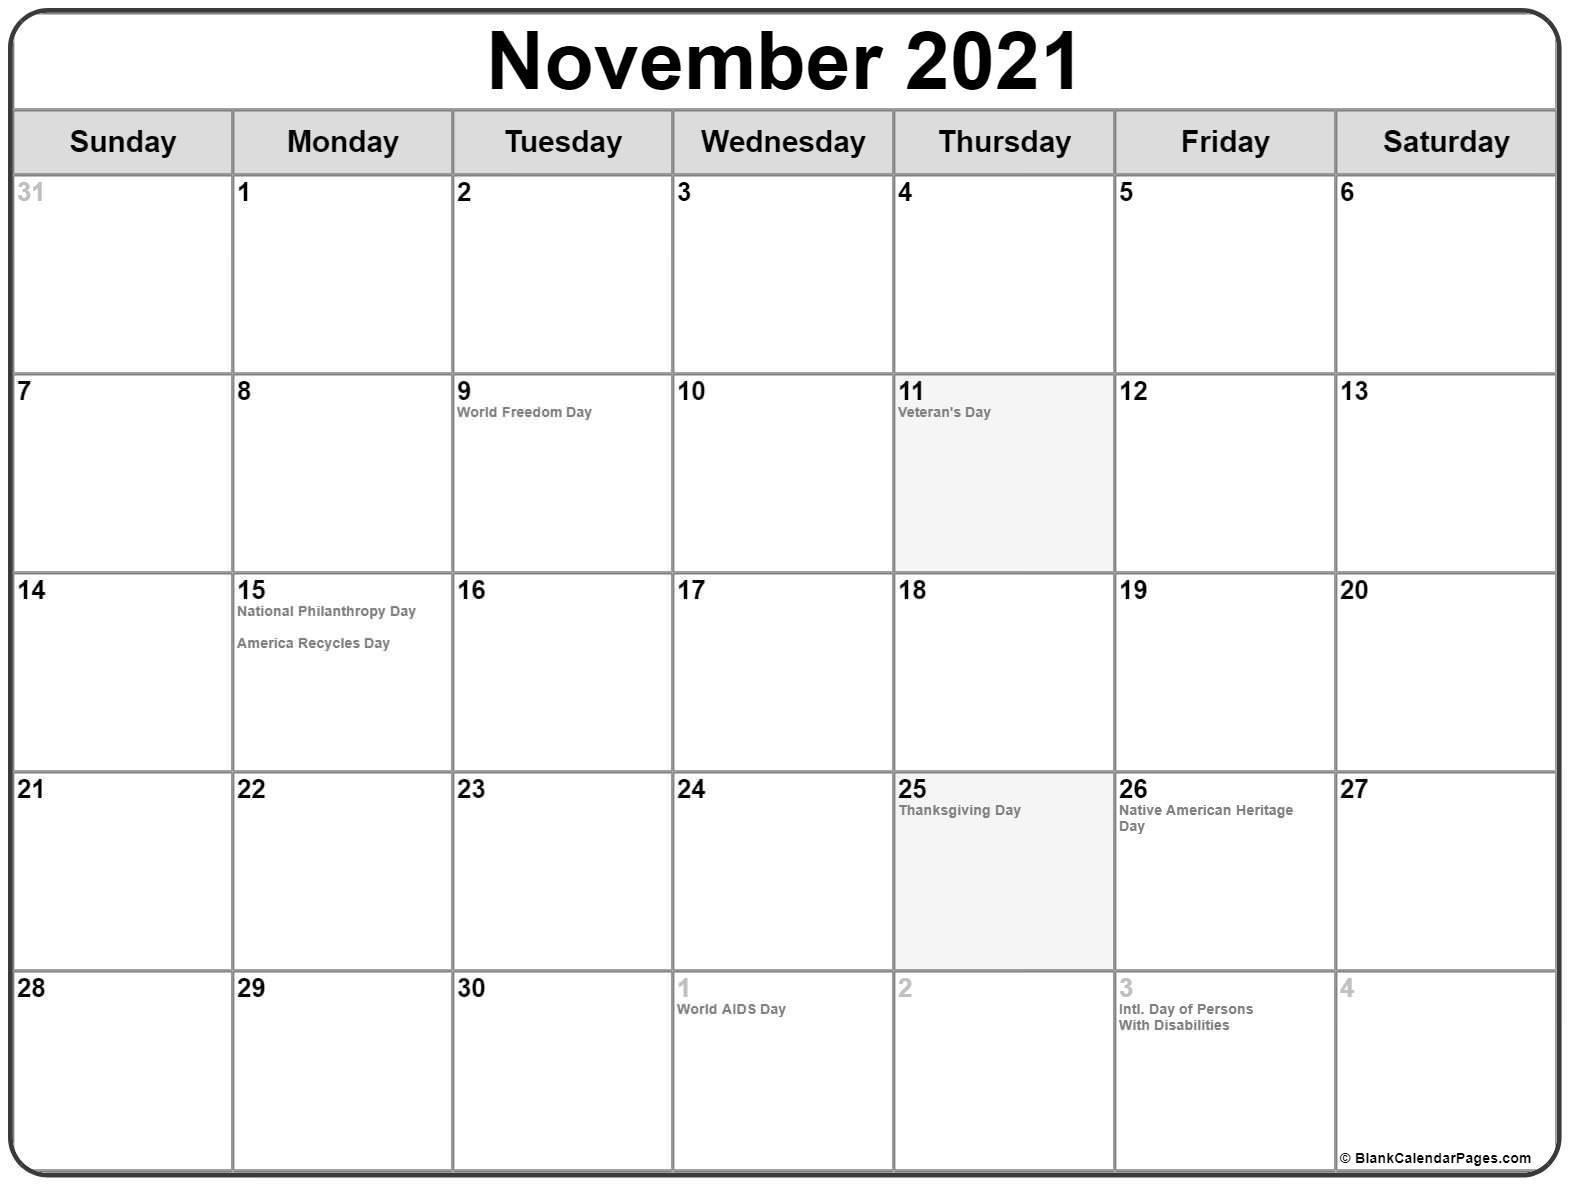 November 2021 Calendar With Holidays-November 2021 Fill In Calendar